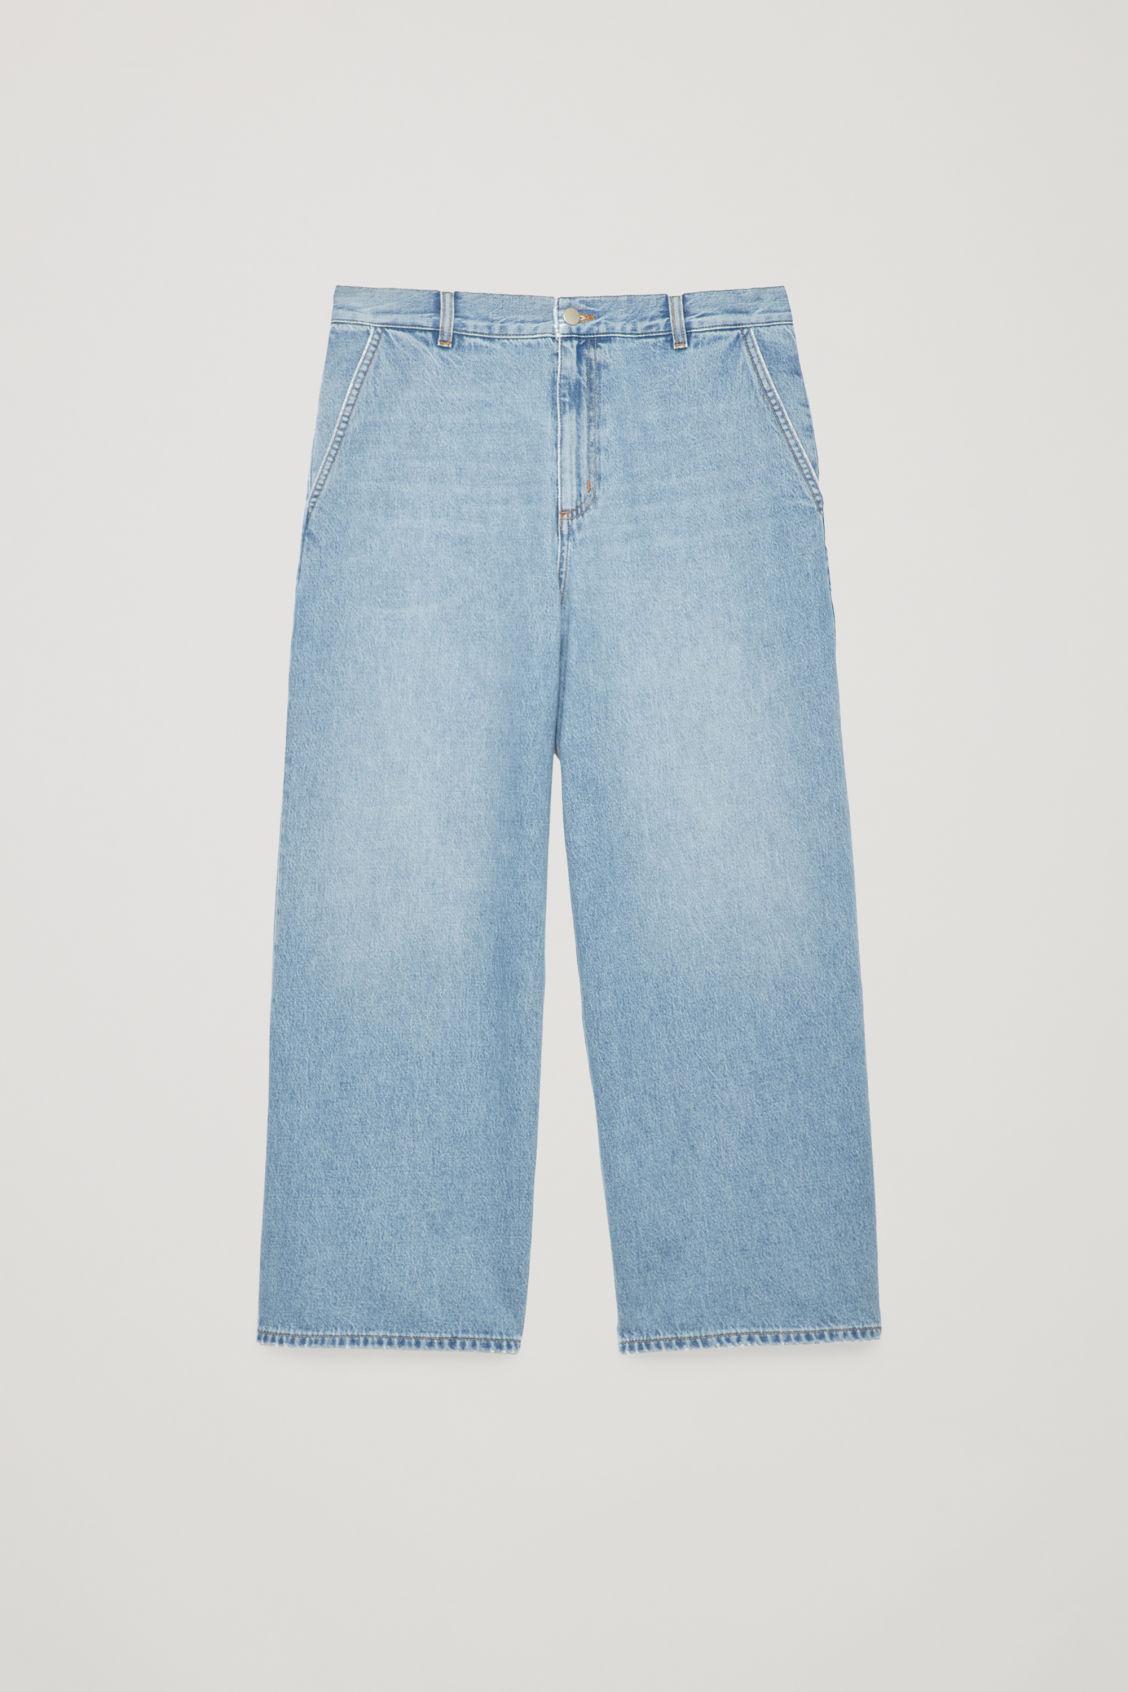 7d487f61937b Cos Barrel Leg Jeans In Blue | ModeSens